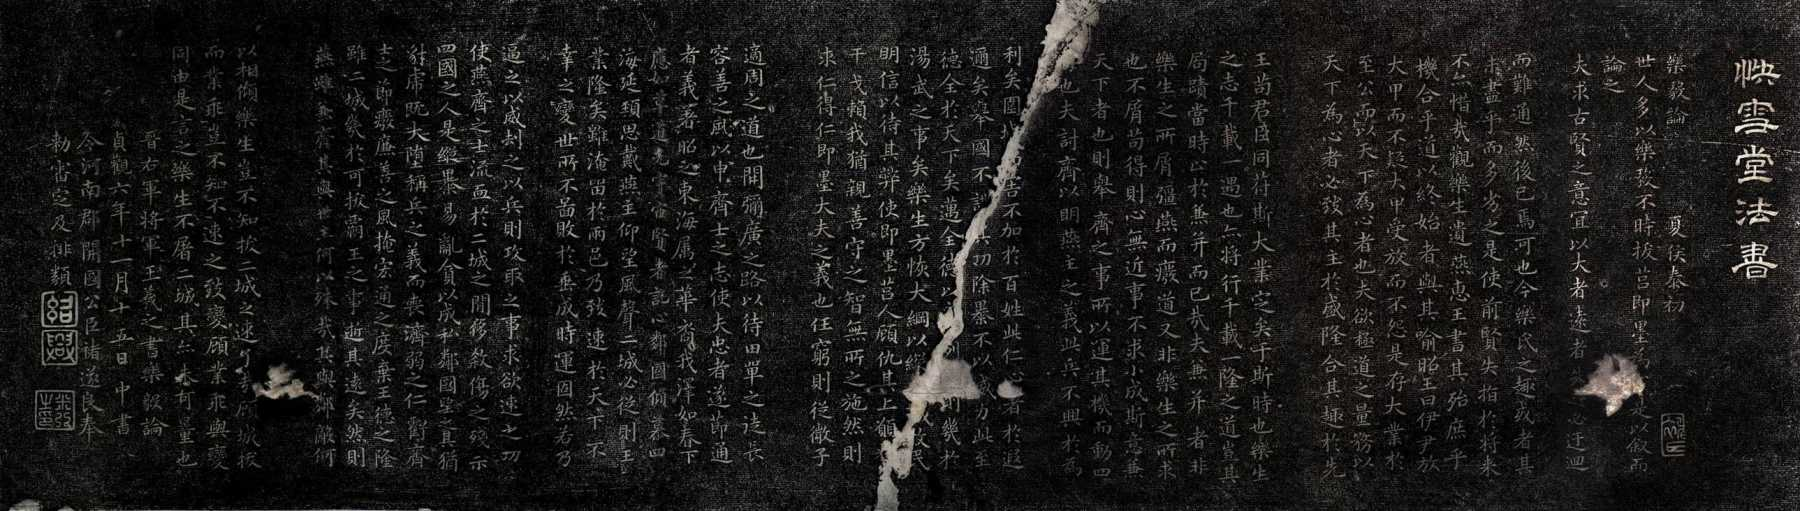 wangxizhi_leyilun.jpg